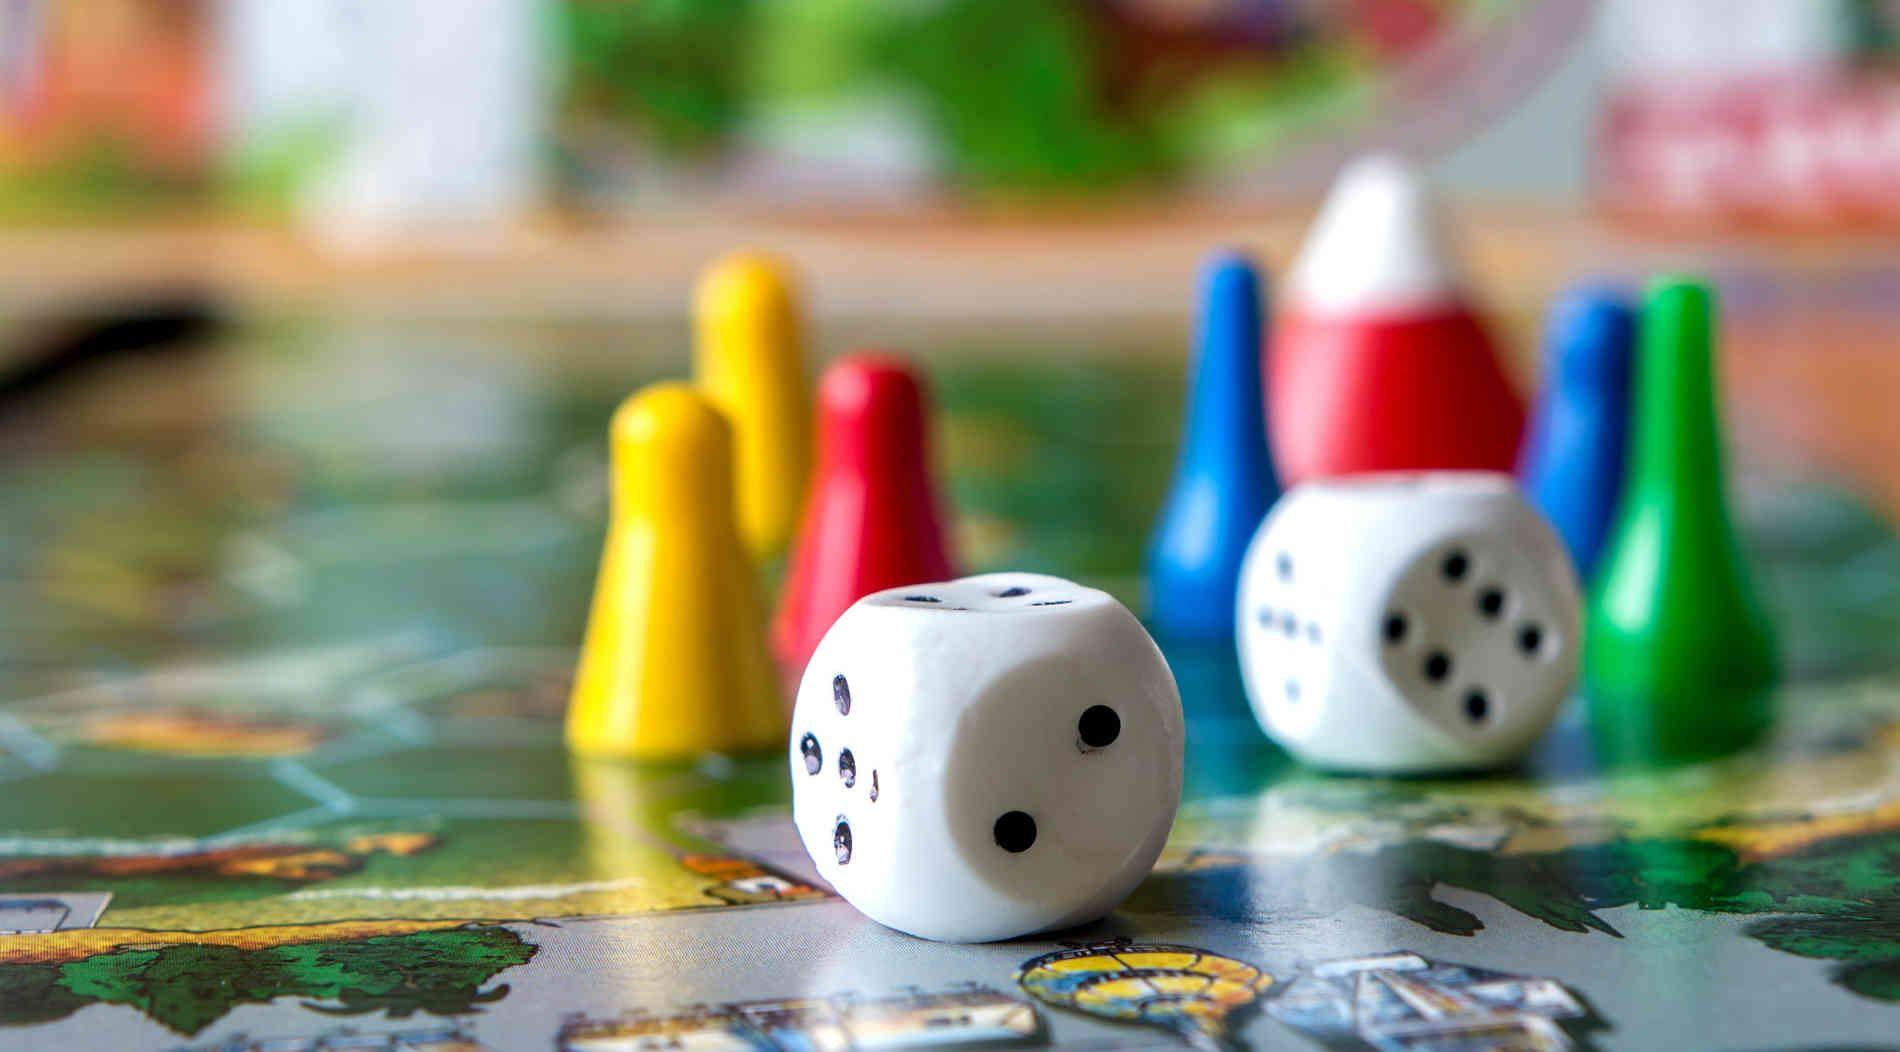 [Thalia/Club] Sammeldeal, Spieloffensive! The Mind Extreme, Anubixx, Qwinto, Kakerlaloop, Sherlock, Würfelspiel, Kartenspiel